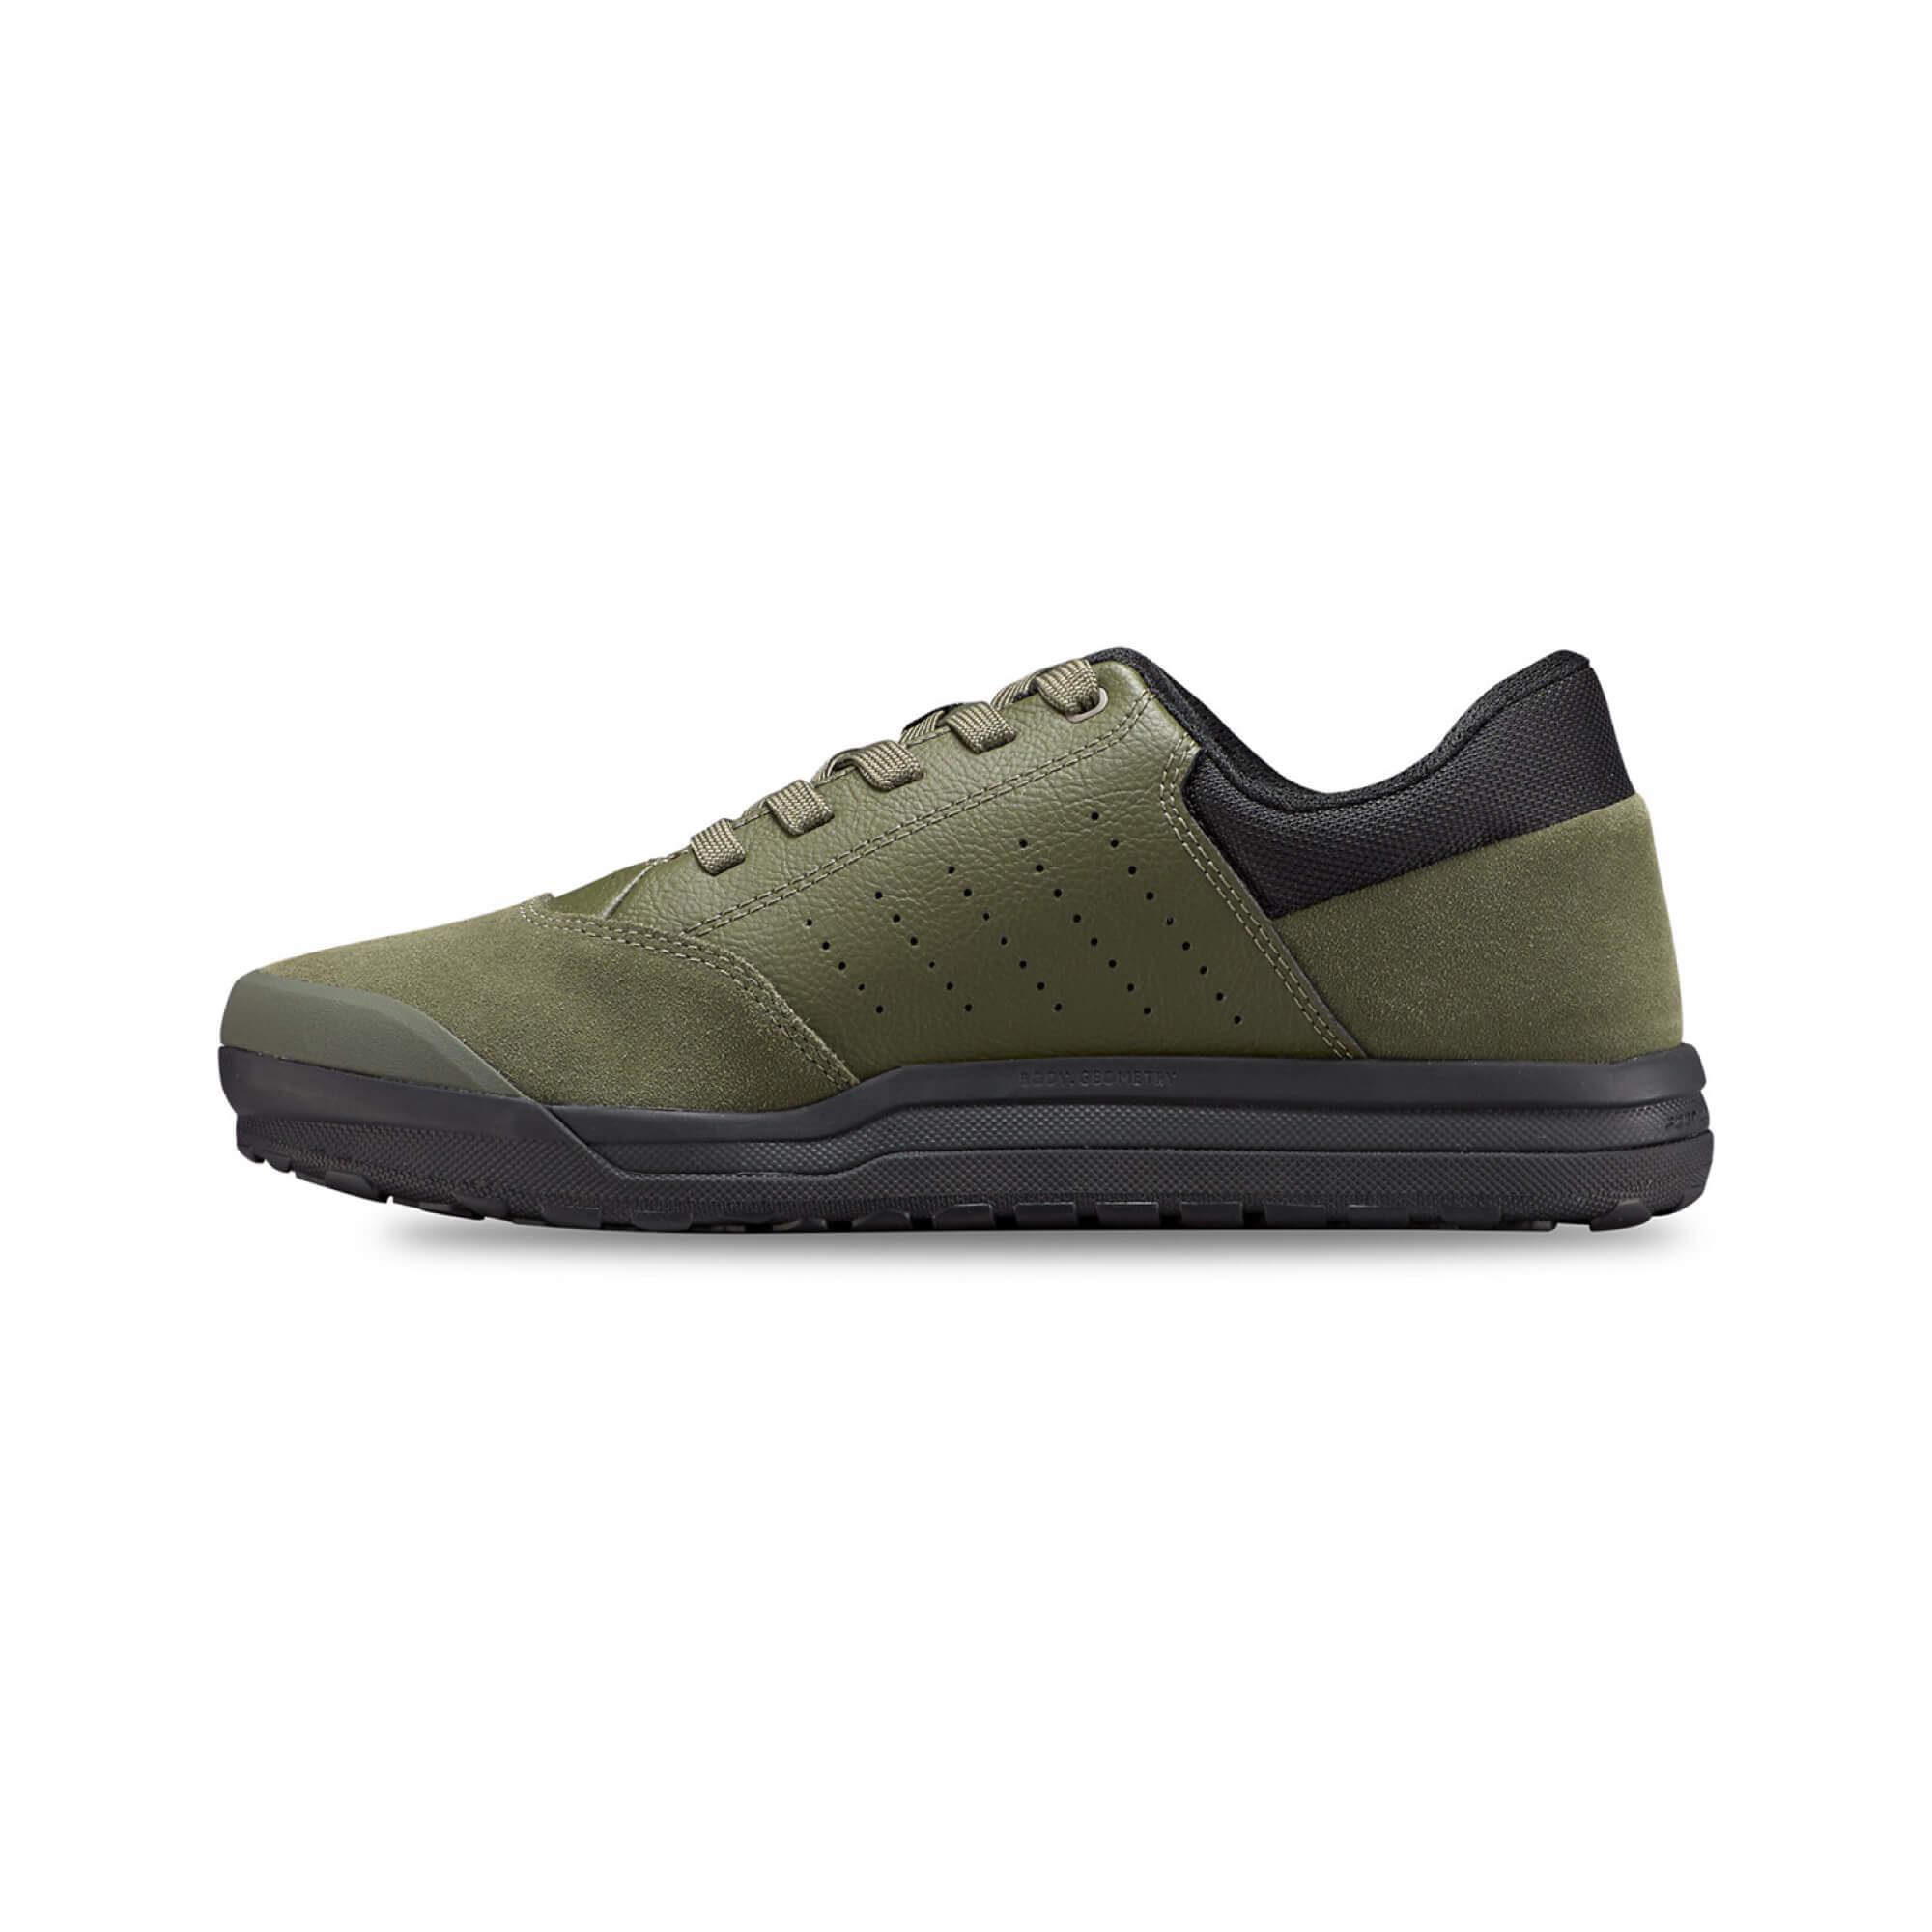 2FO Roost Flat MTB Shoe-7